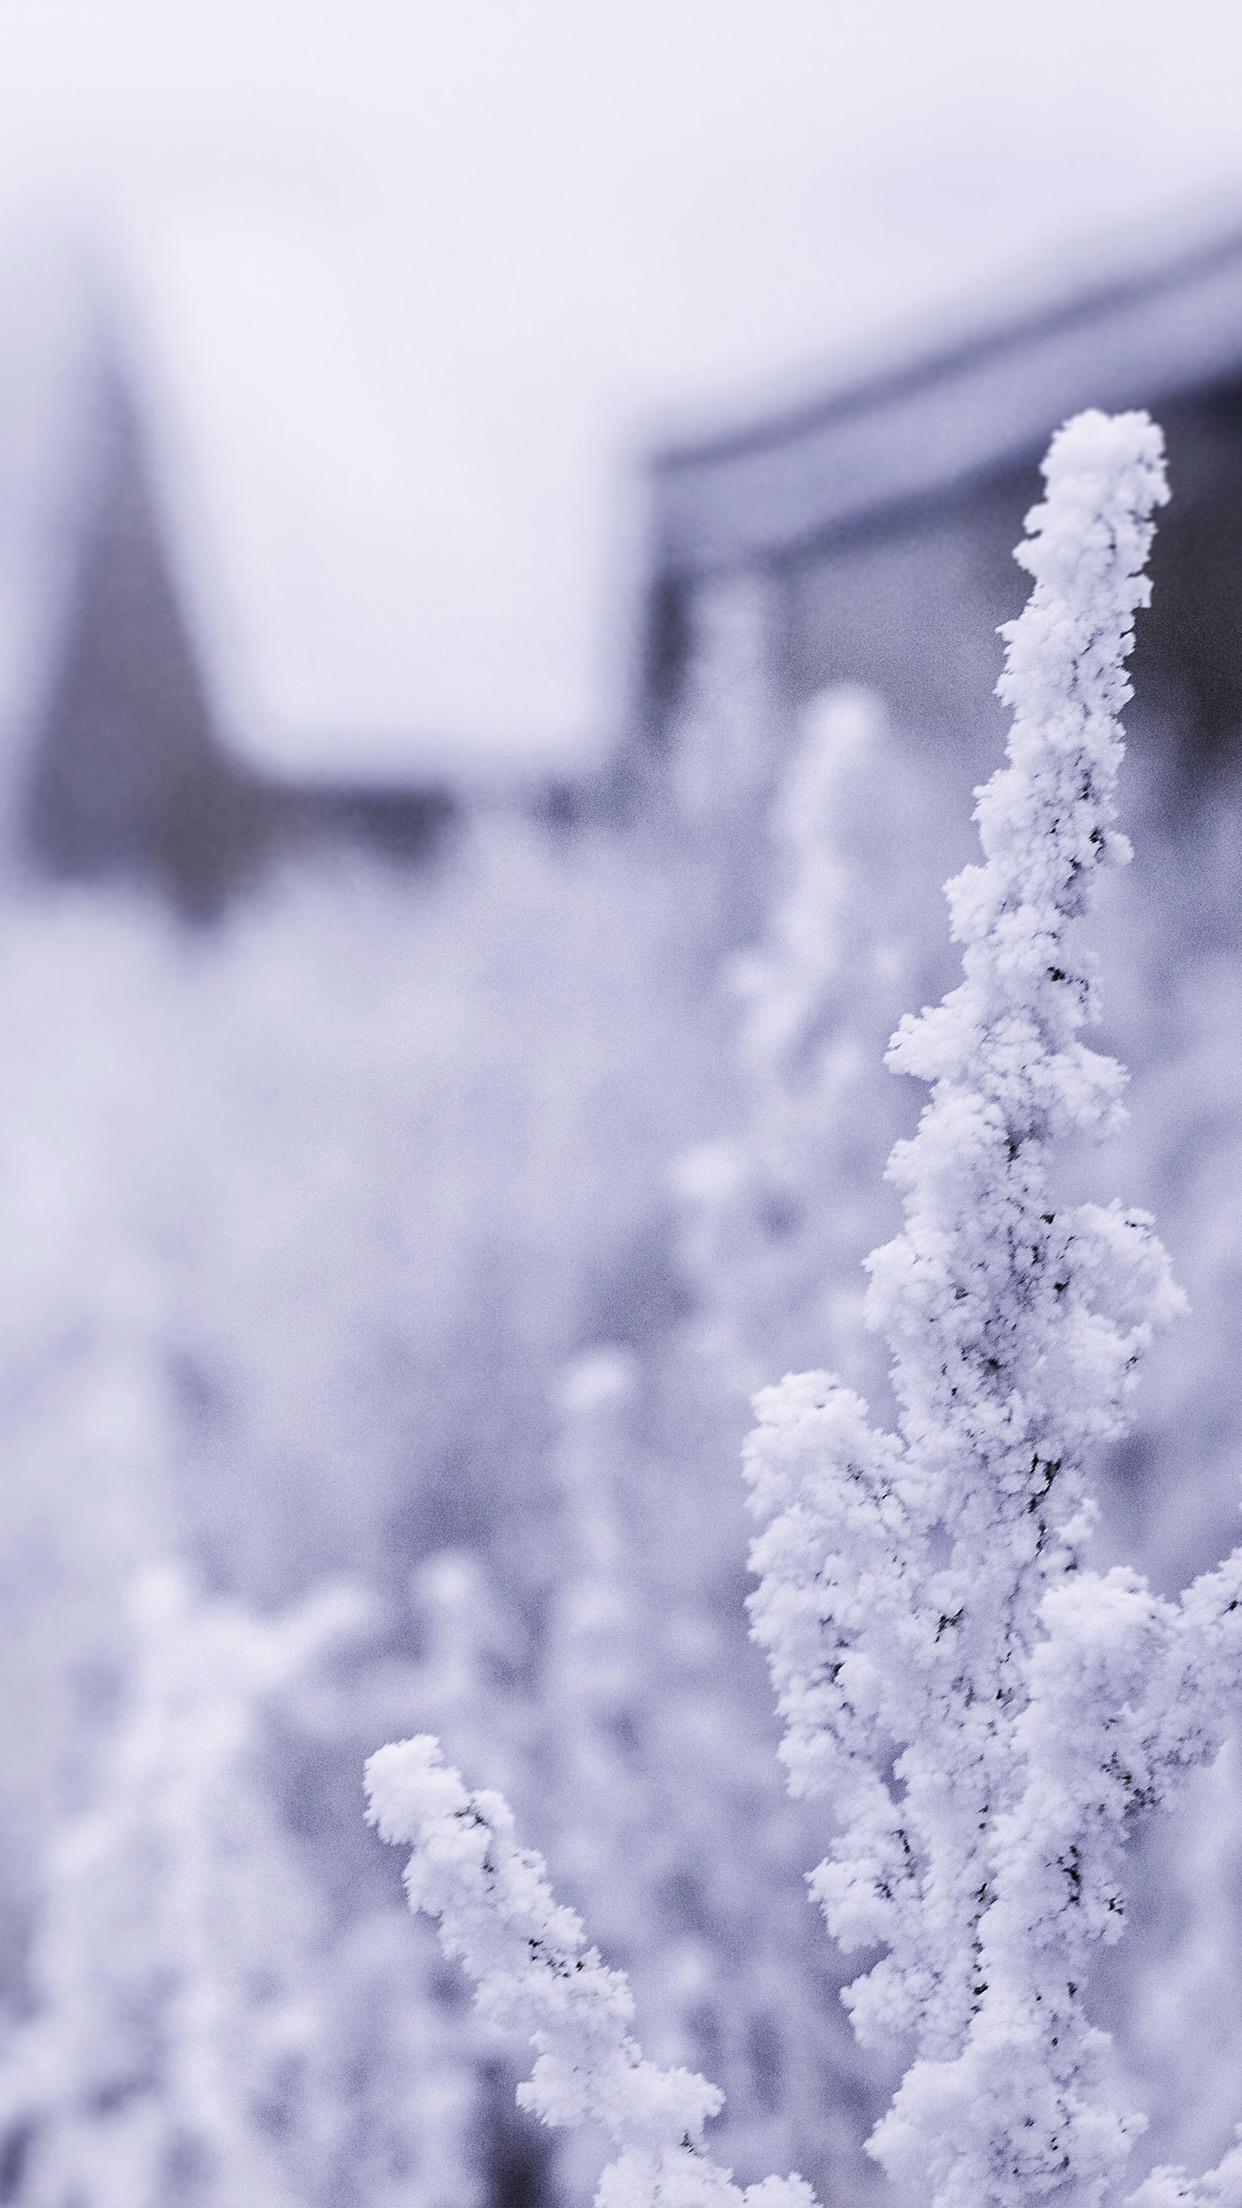 Iphone 6 Wallpaper White Flower 1242x2208 Wallpaper Teahub Io